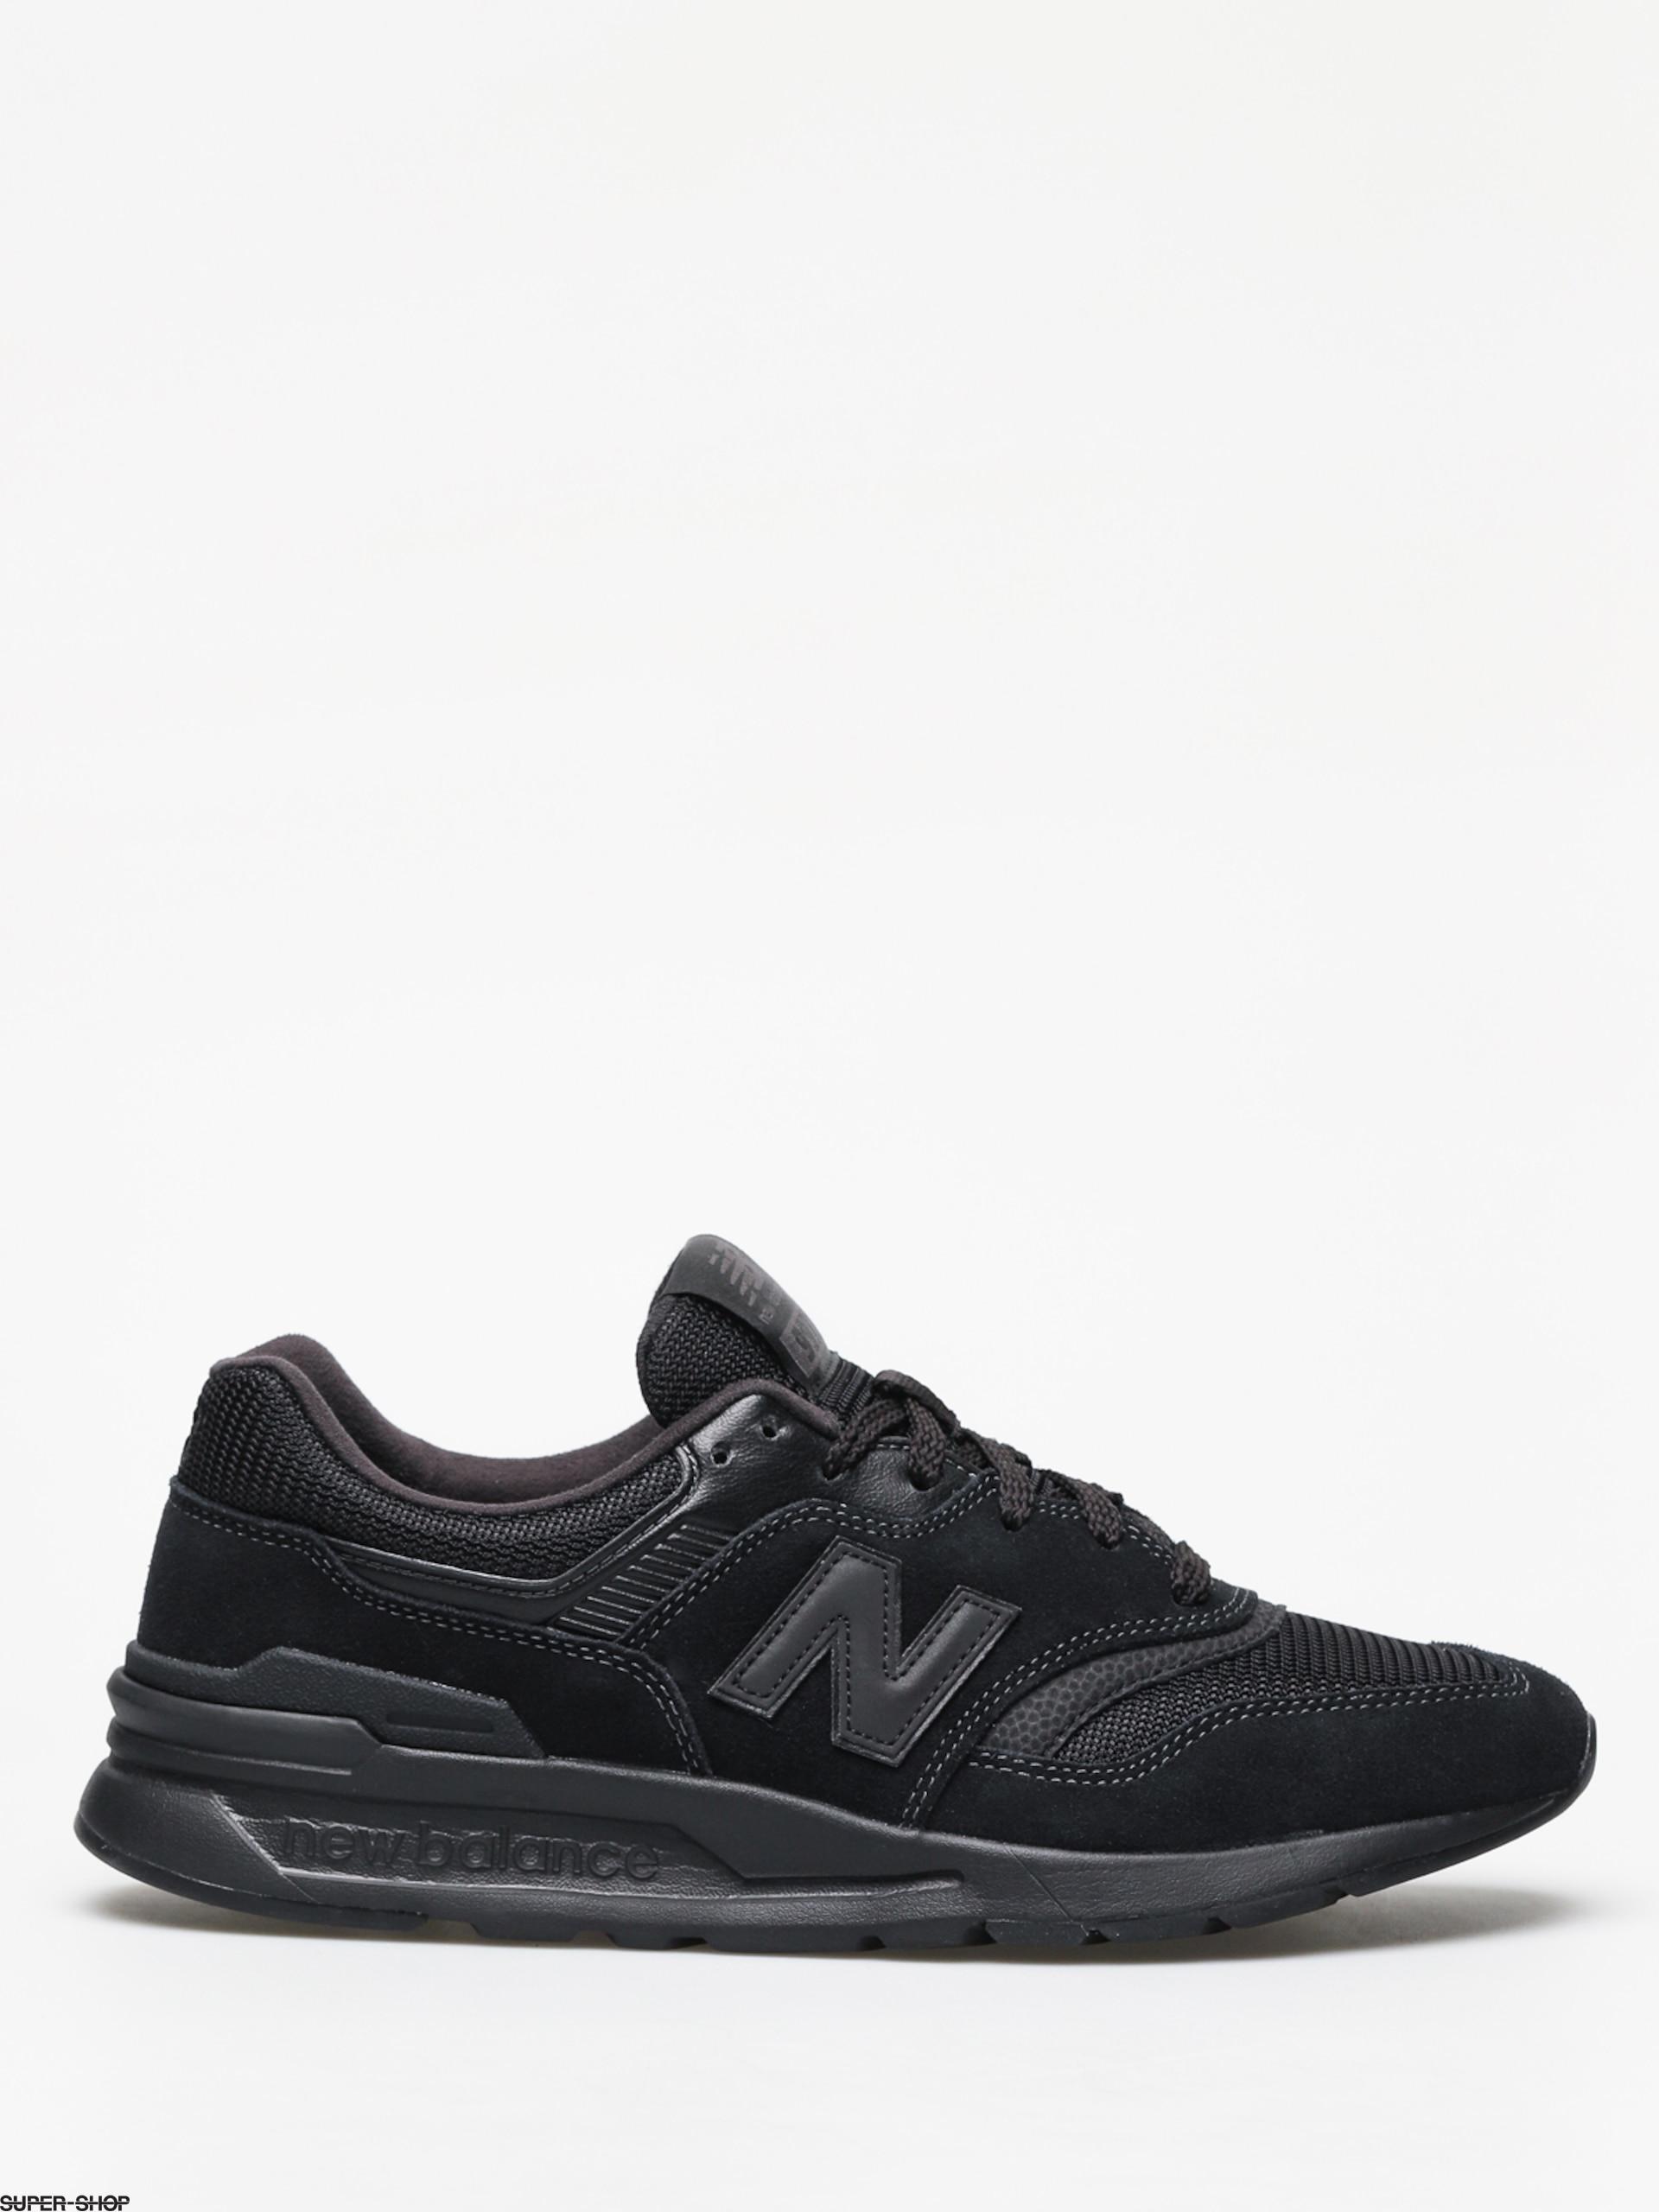 New Balance 997 Shoes (black)